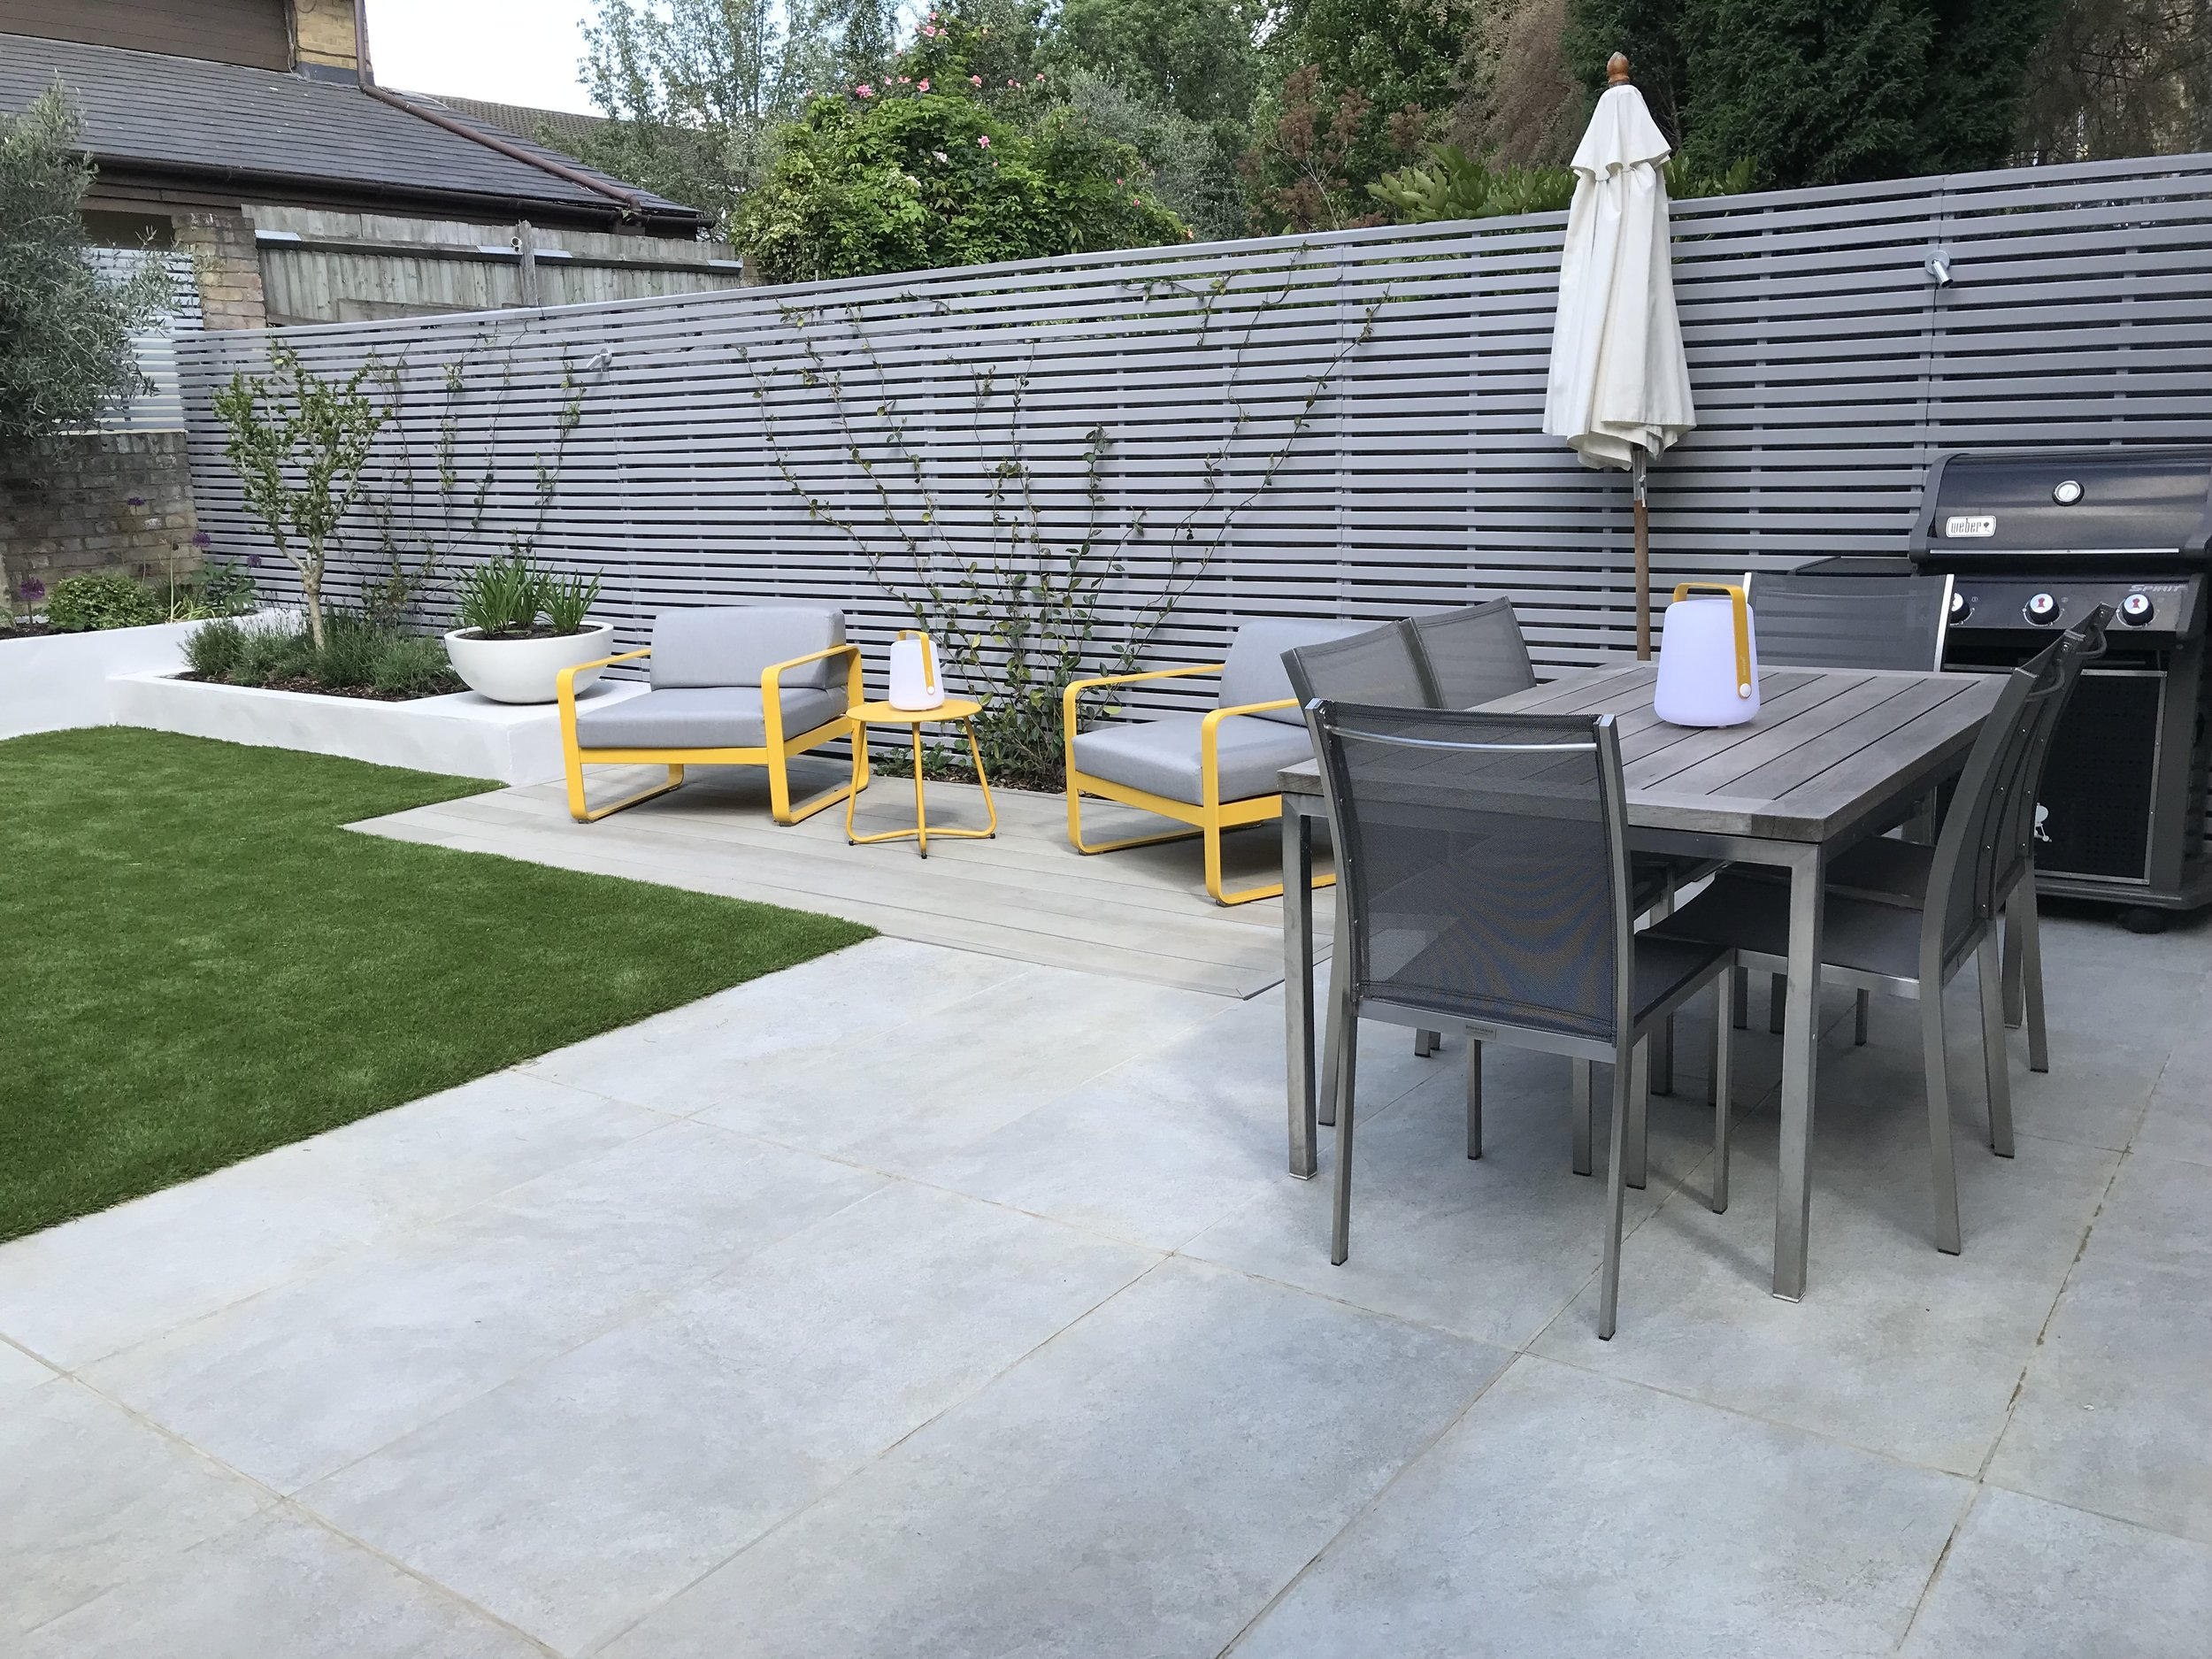 joanna_archer_garden_design_small_family_gardenW4_b.jpg